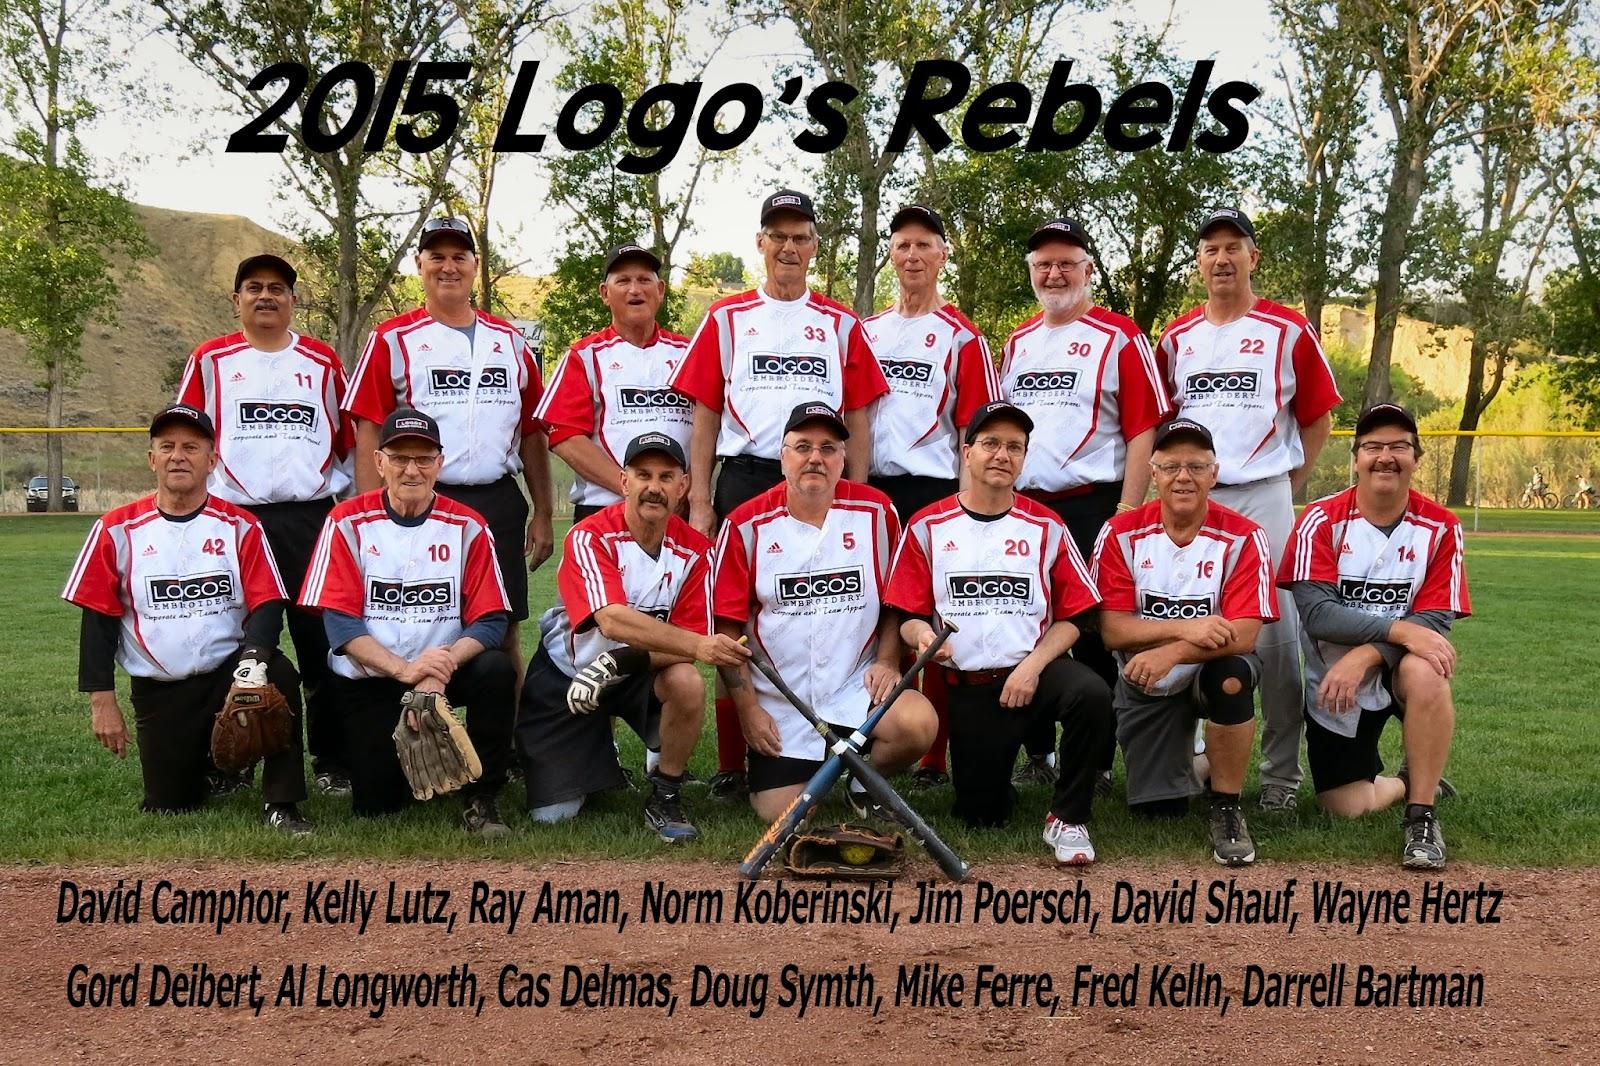 Logo's Rebels 3215F.jpg